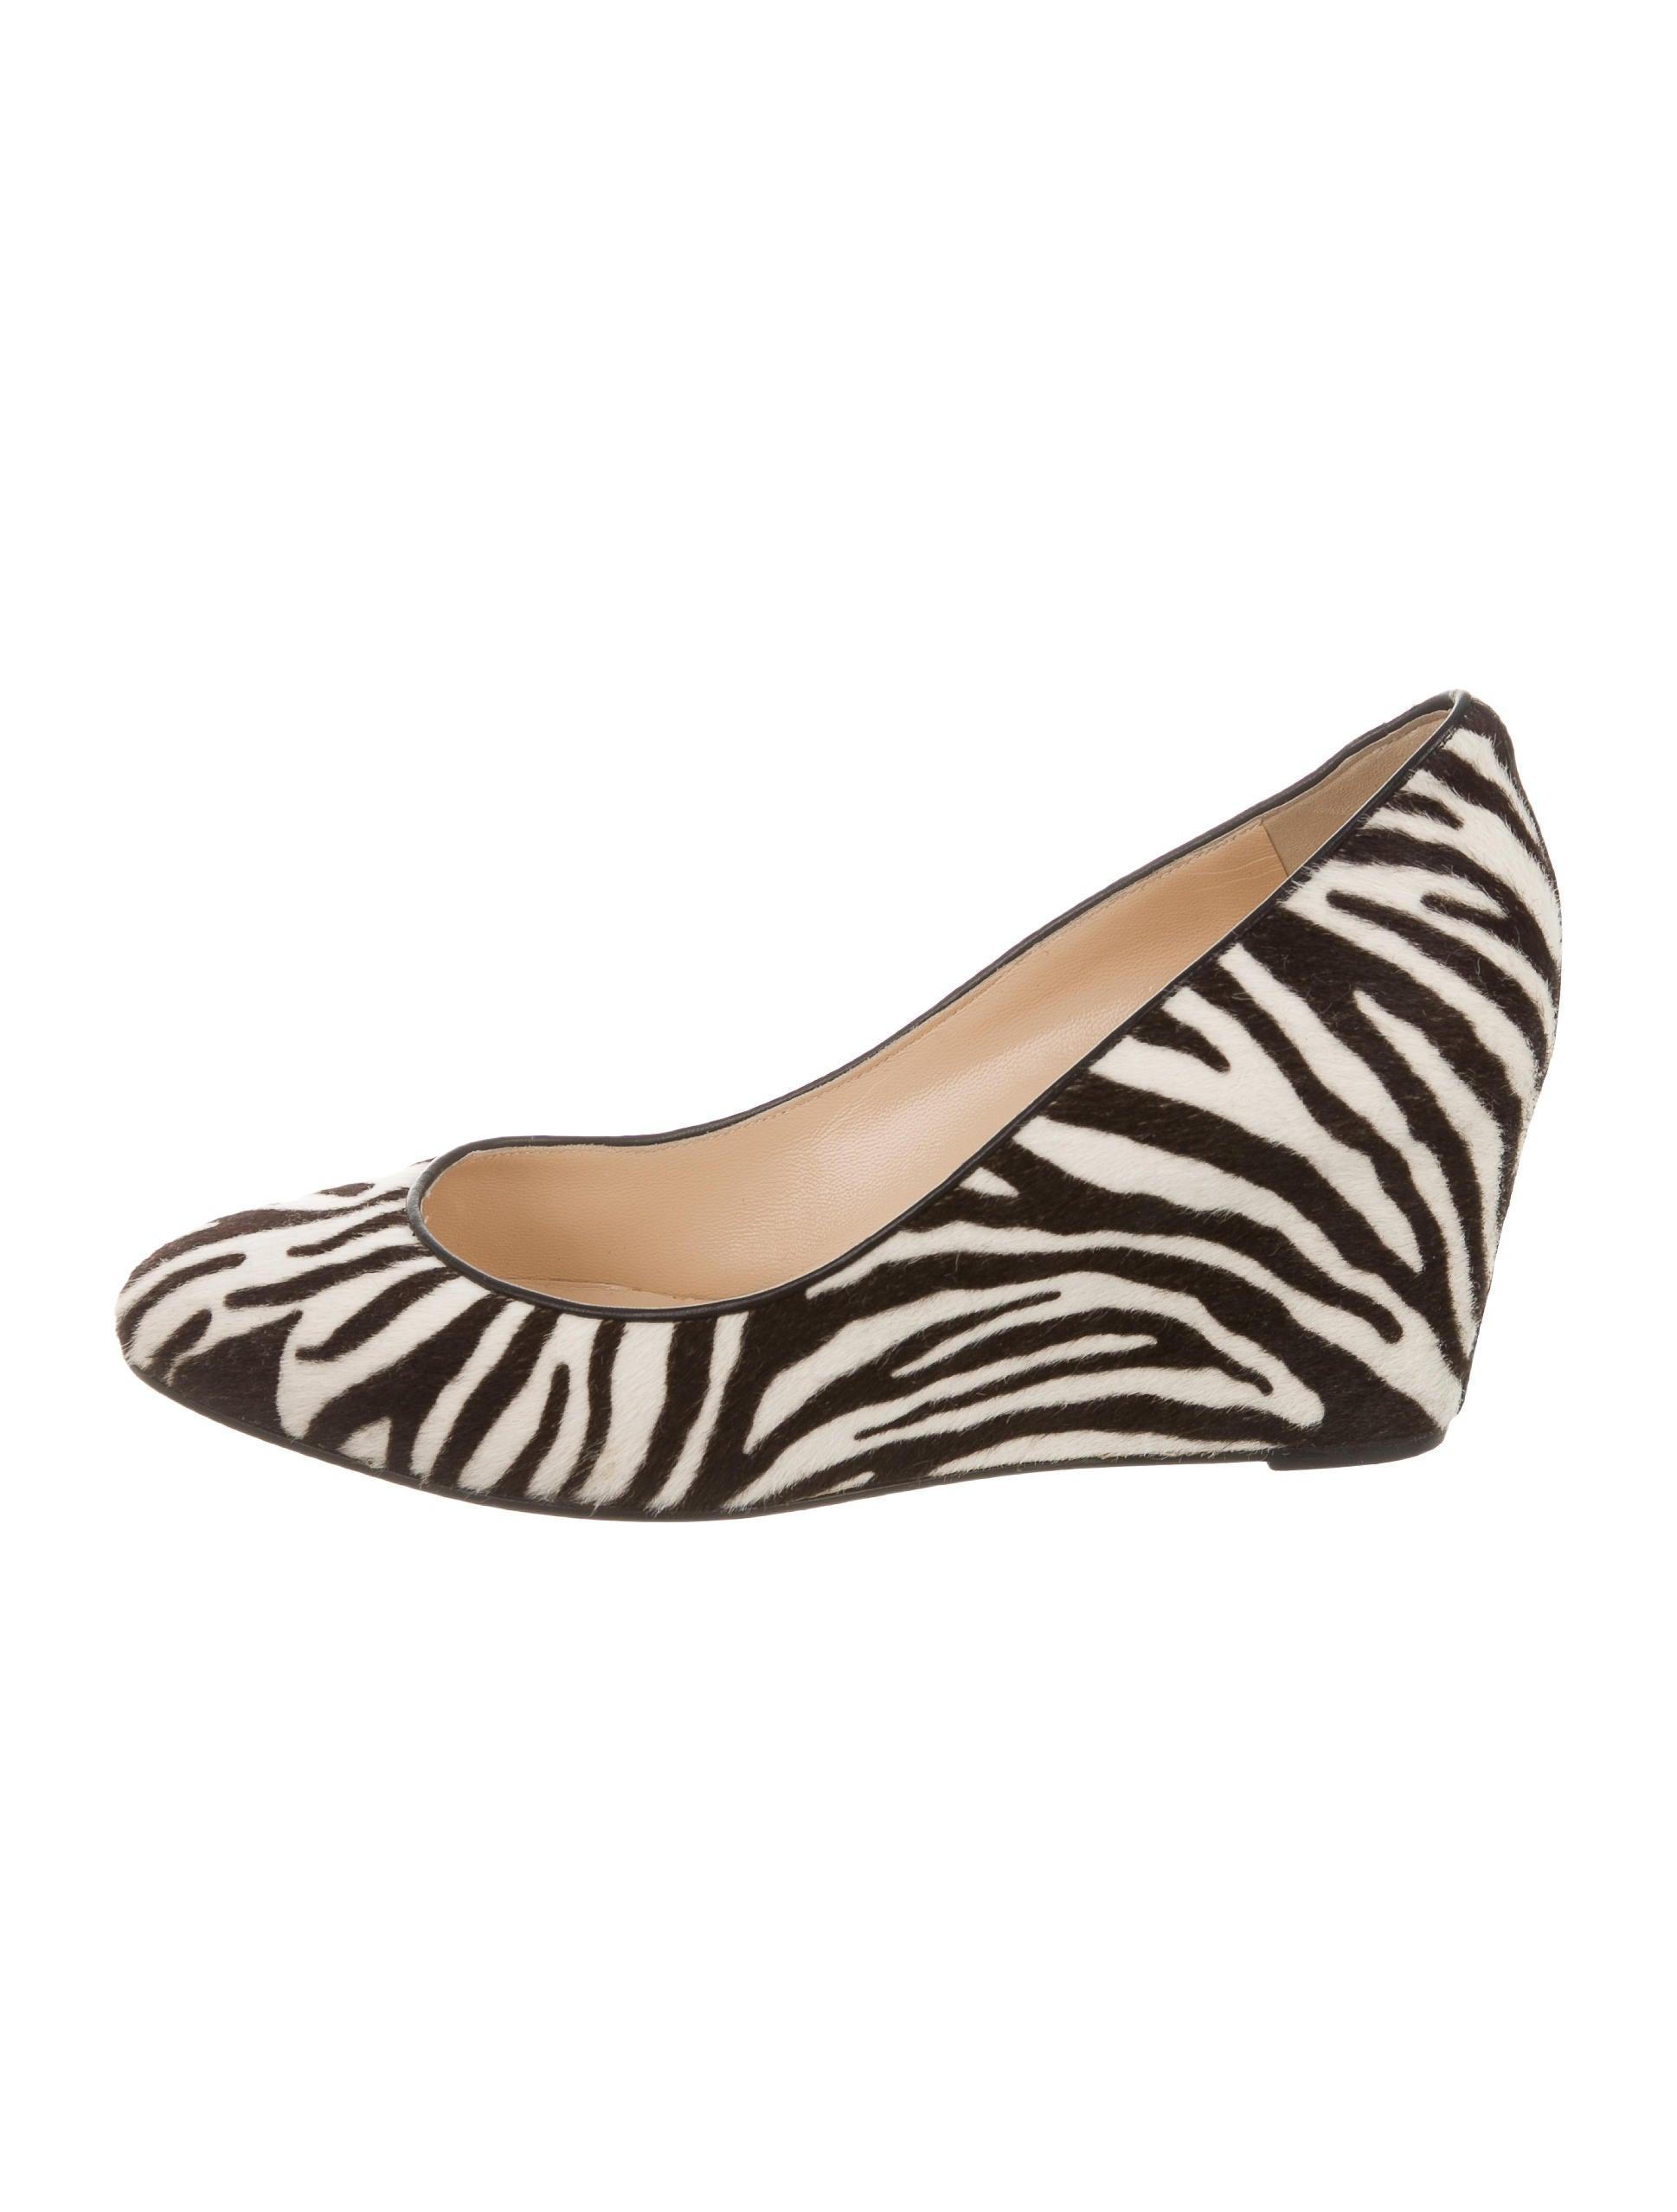 christian louboutin zebra print wedges shoes cht52978